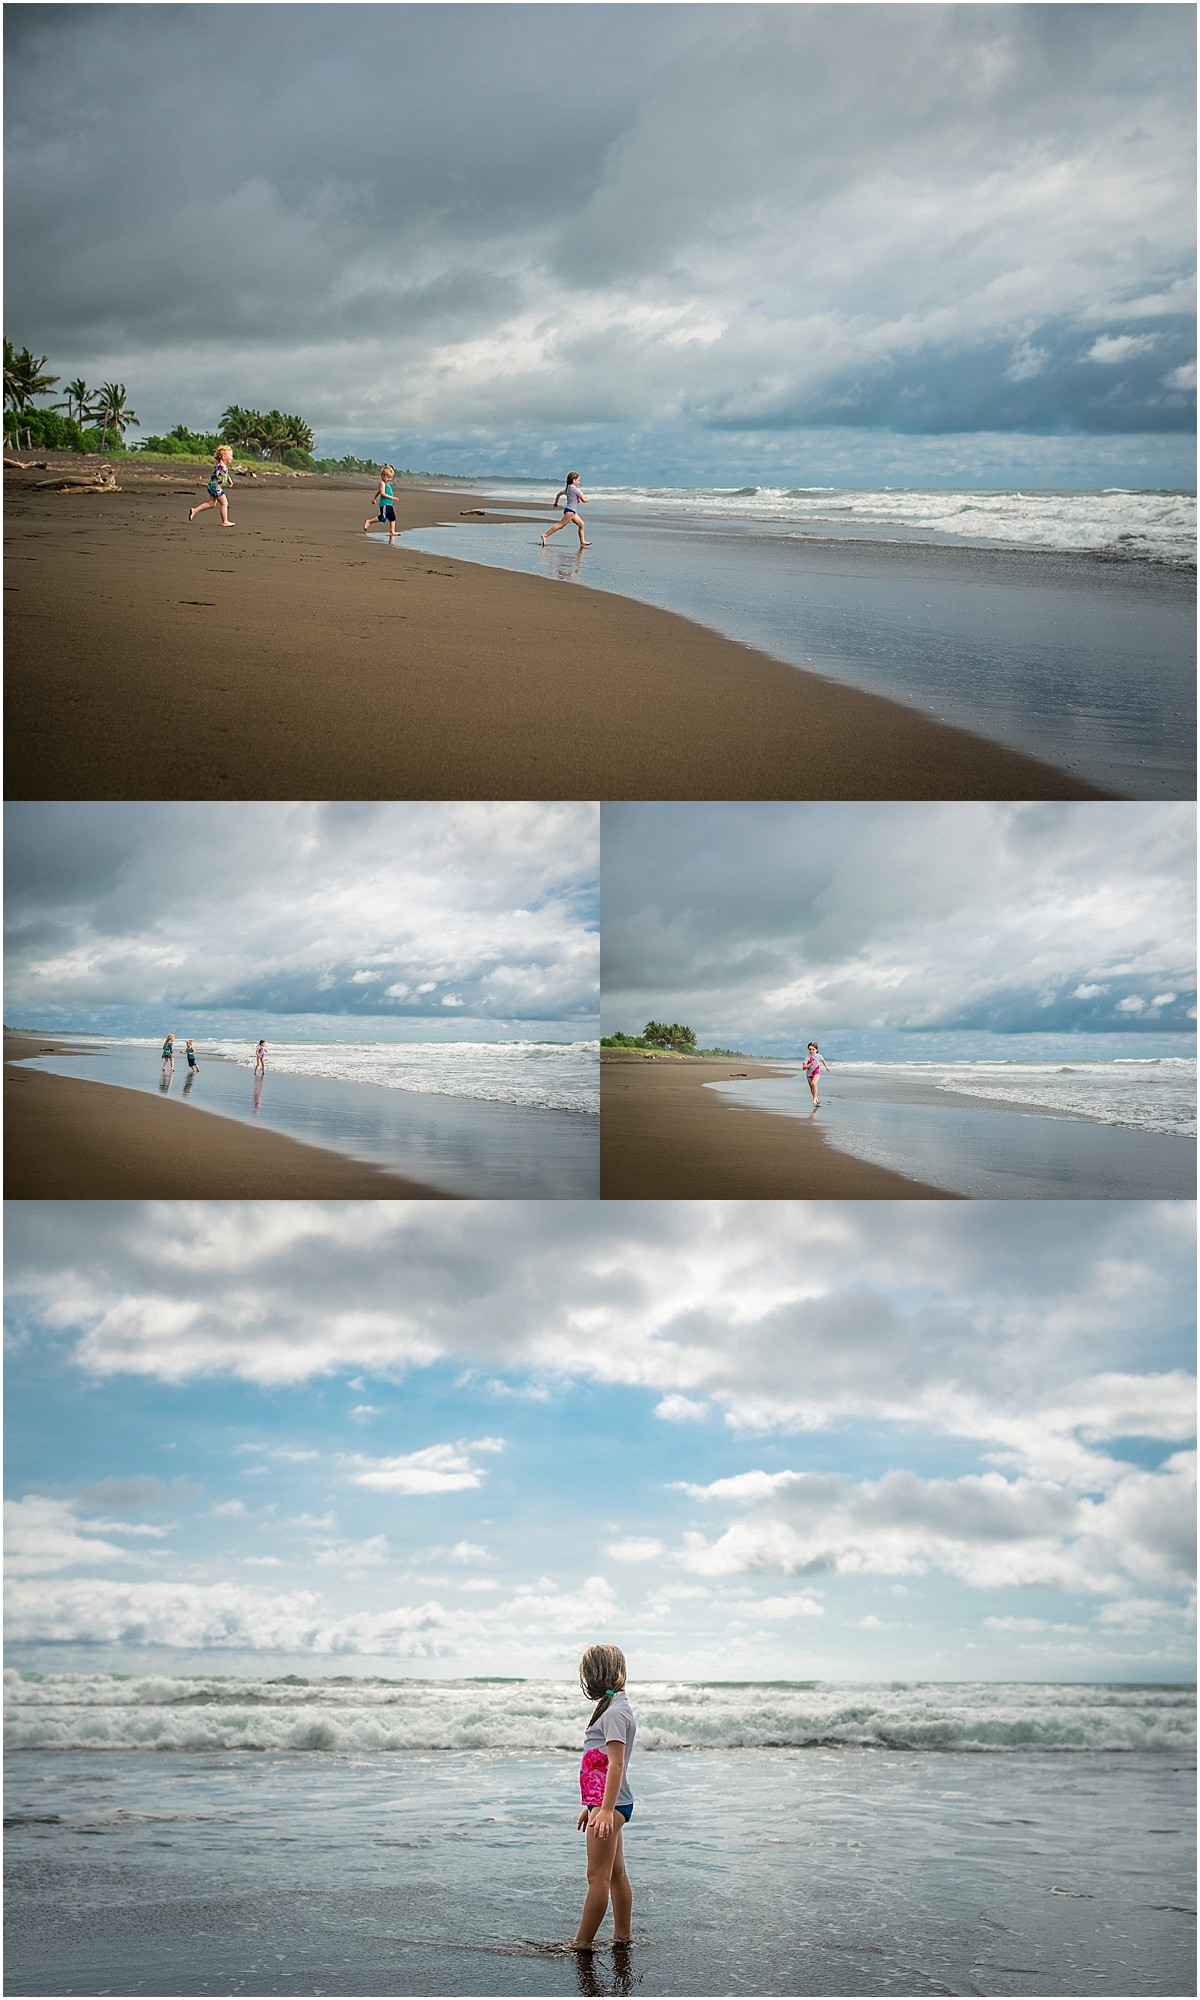 Ashley_Rogers_Photography_South_Florida_Photographer_Orlando_Photographer_Costa_Rica_Photographer_1636.jpg